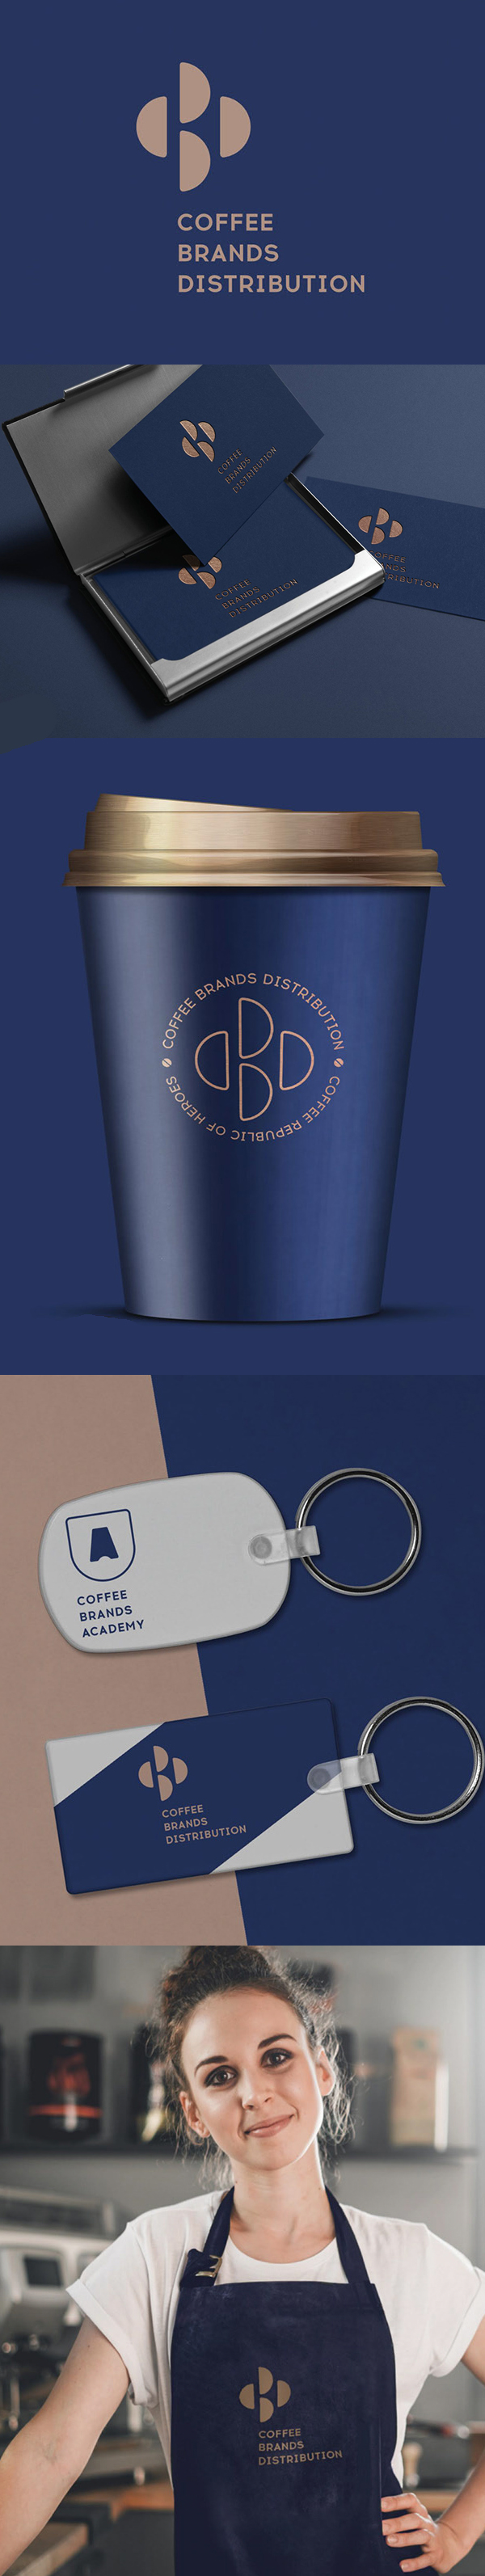 Branding: Cofee Brands Distribution by High School of Branding